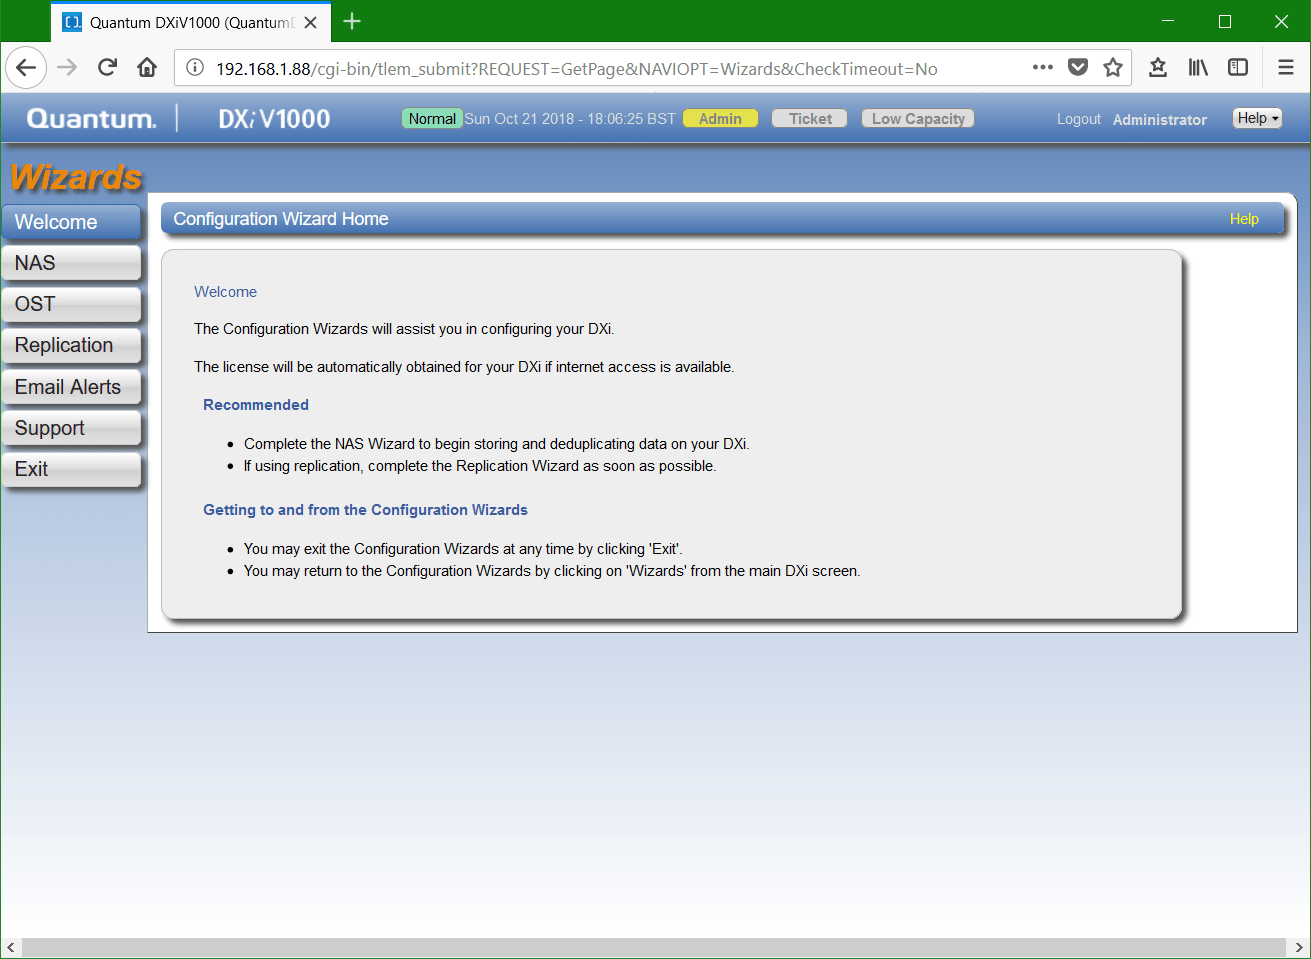 domalab.com Quantum DXi NFS configuration wizard